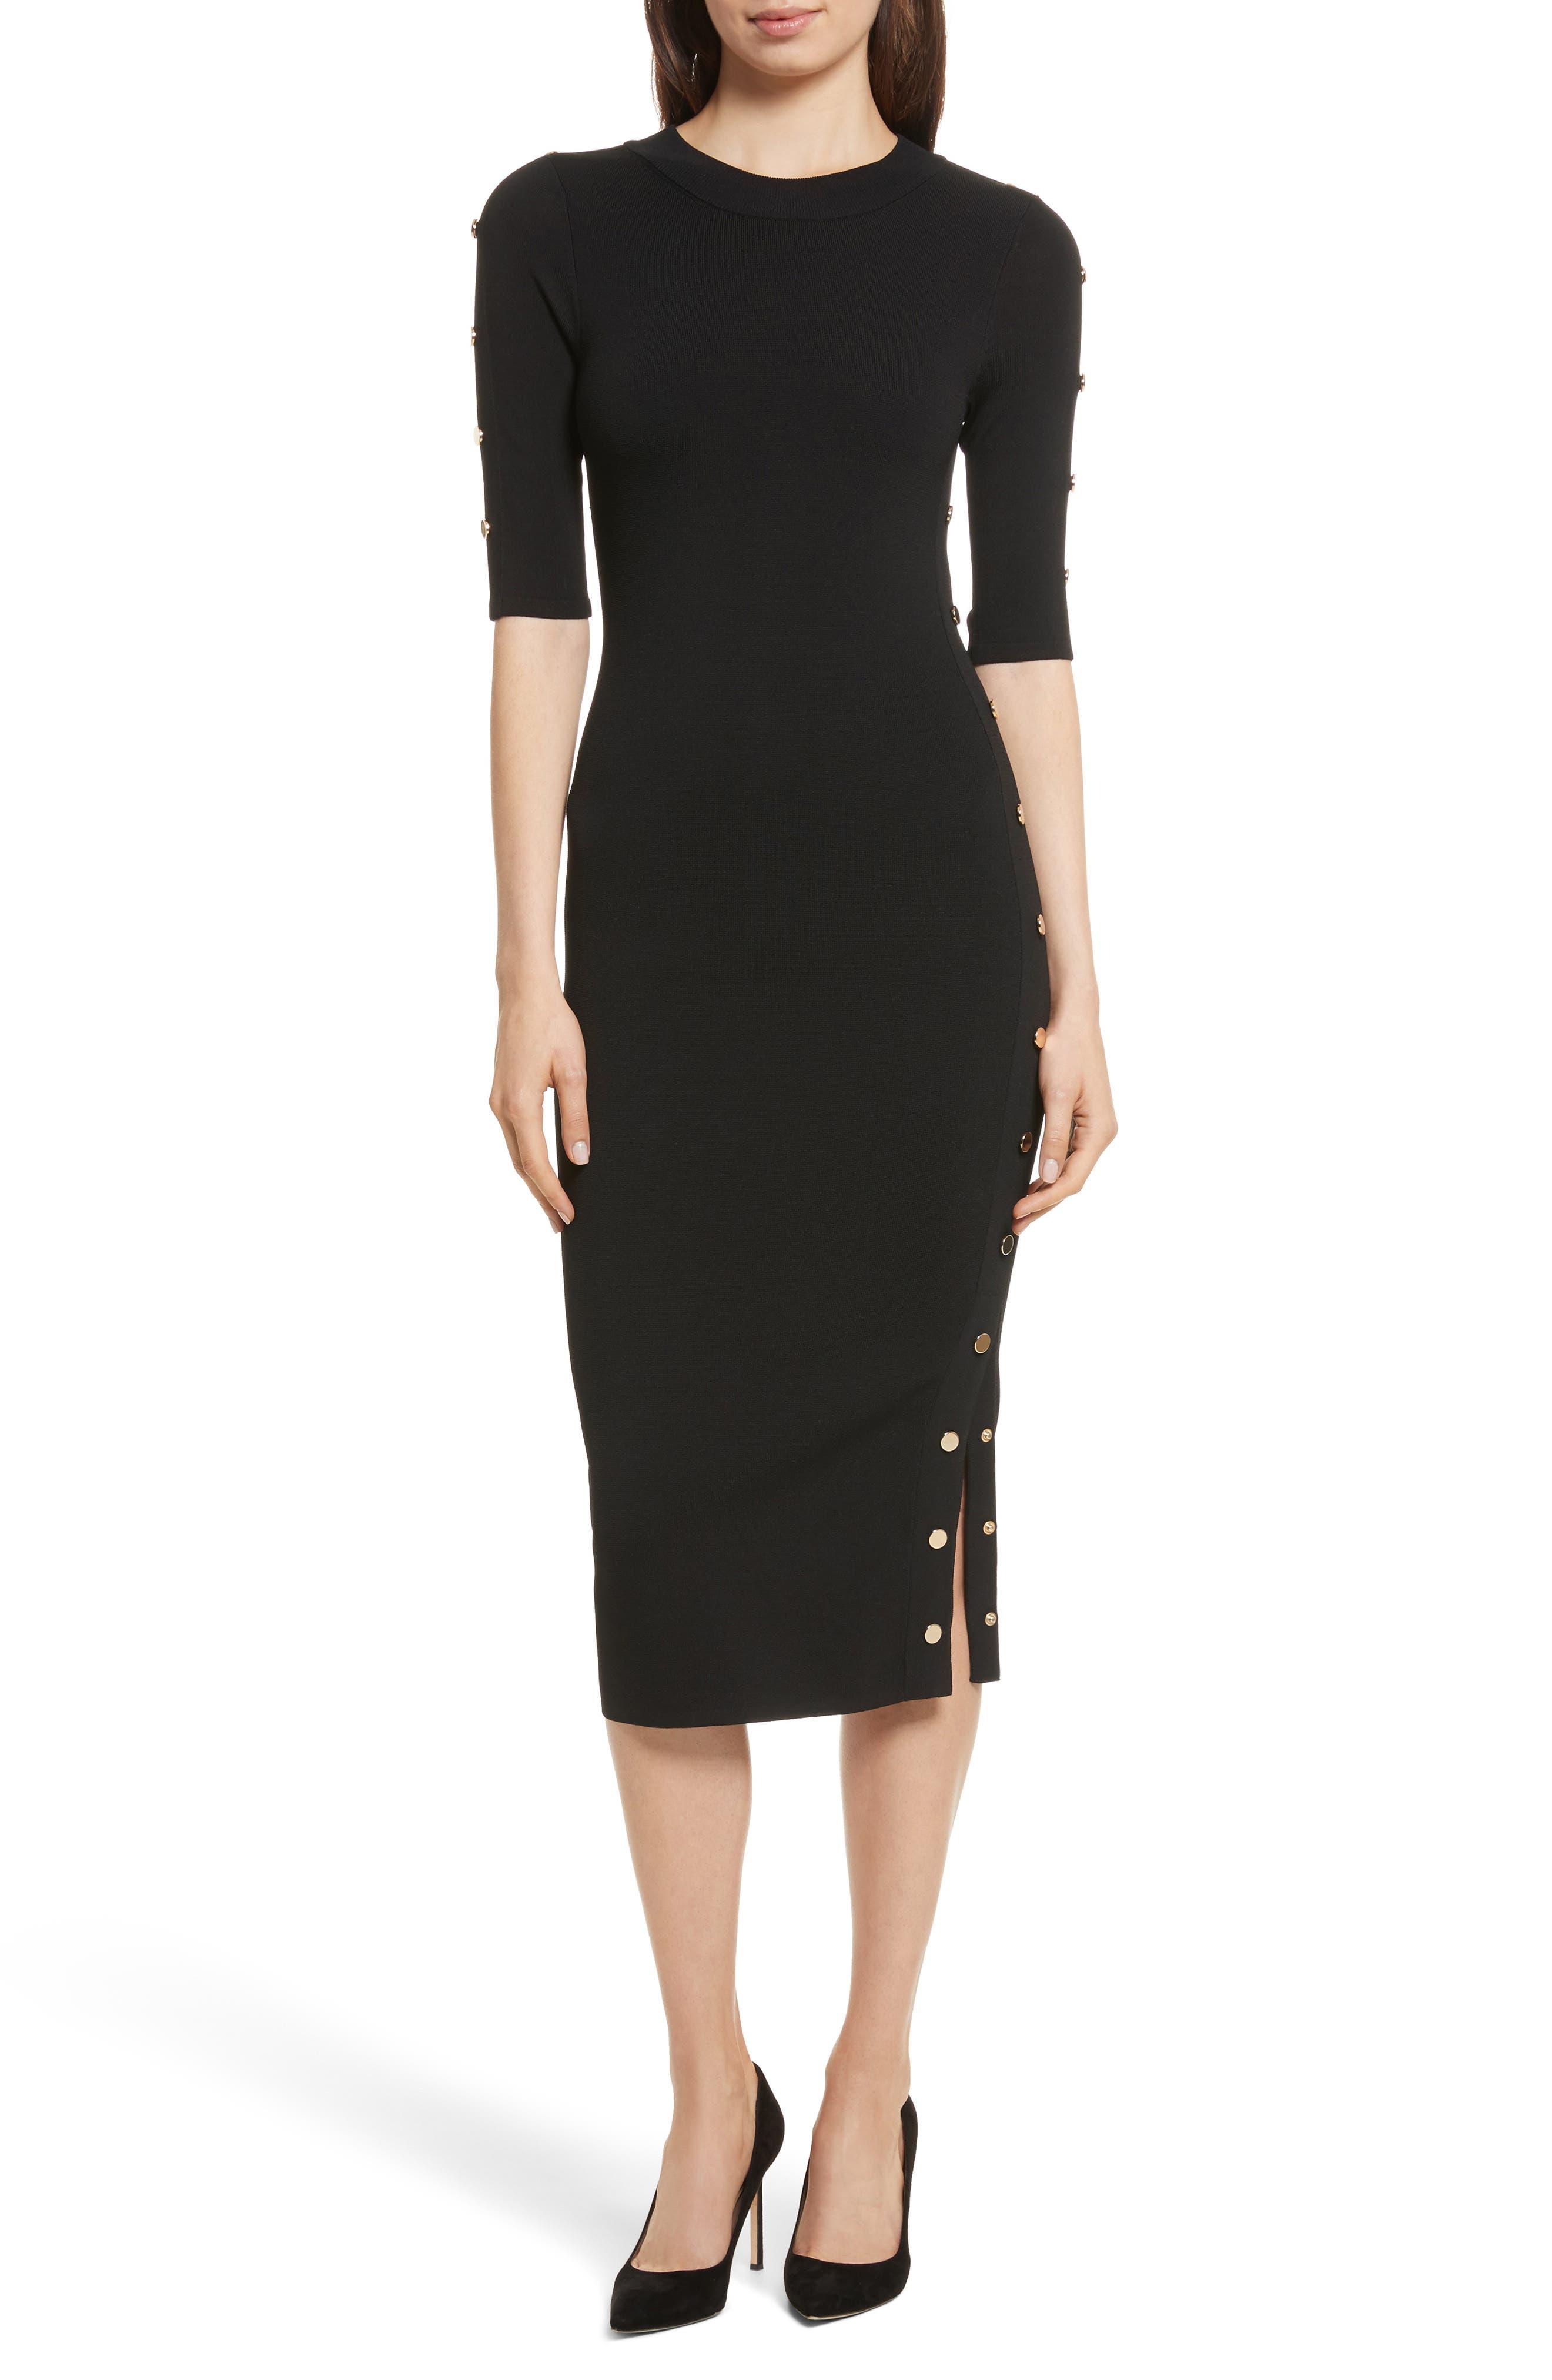 Alternate Image 1 Selected - Veronica Beard Joss Body-Con Knit Dress